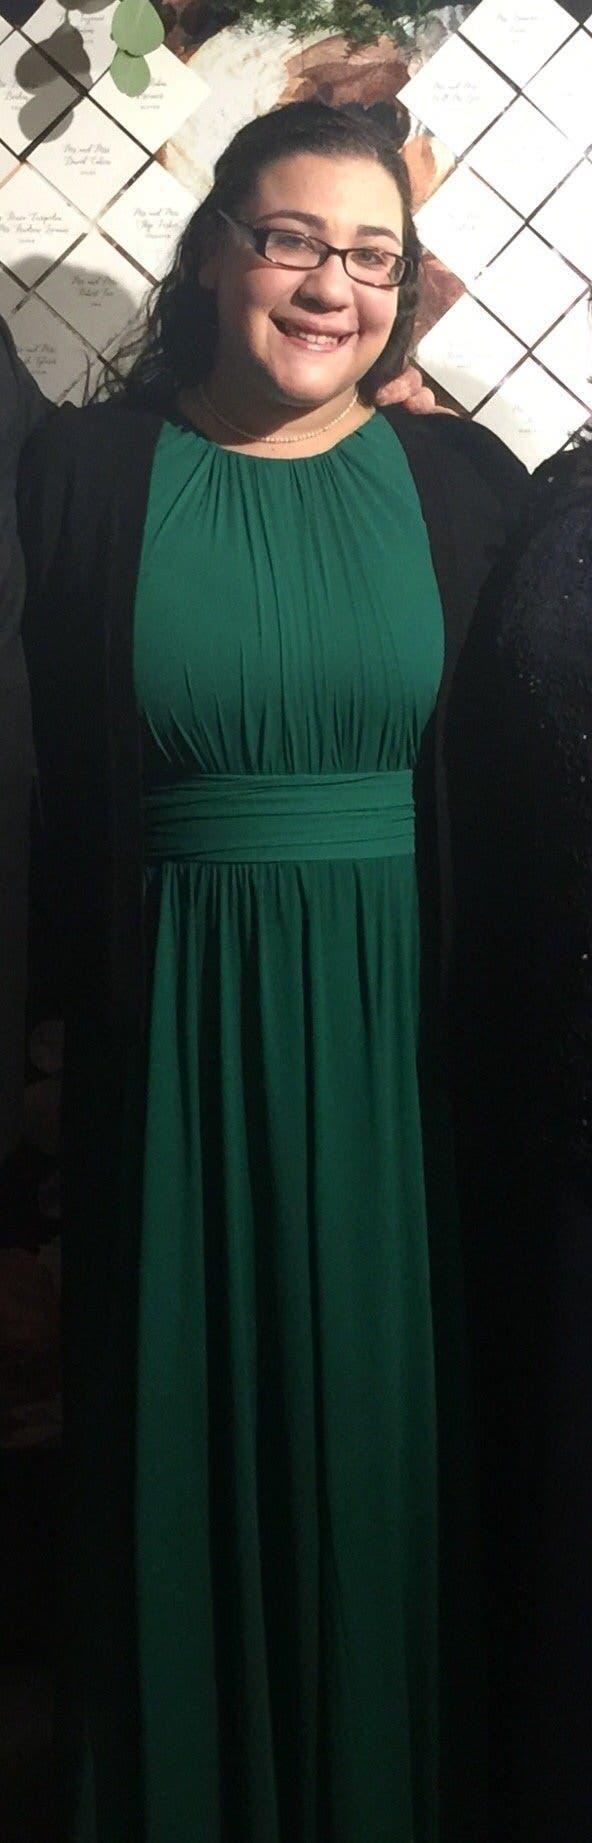 Rent Fluorite Emerald Gala Gown from Badgley Mischka - 298186 | Rent ...